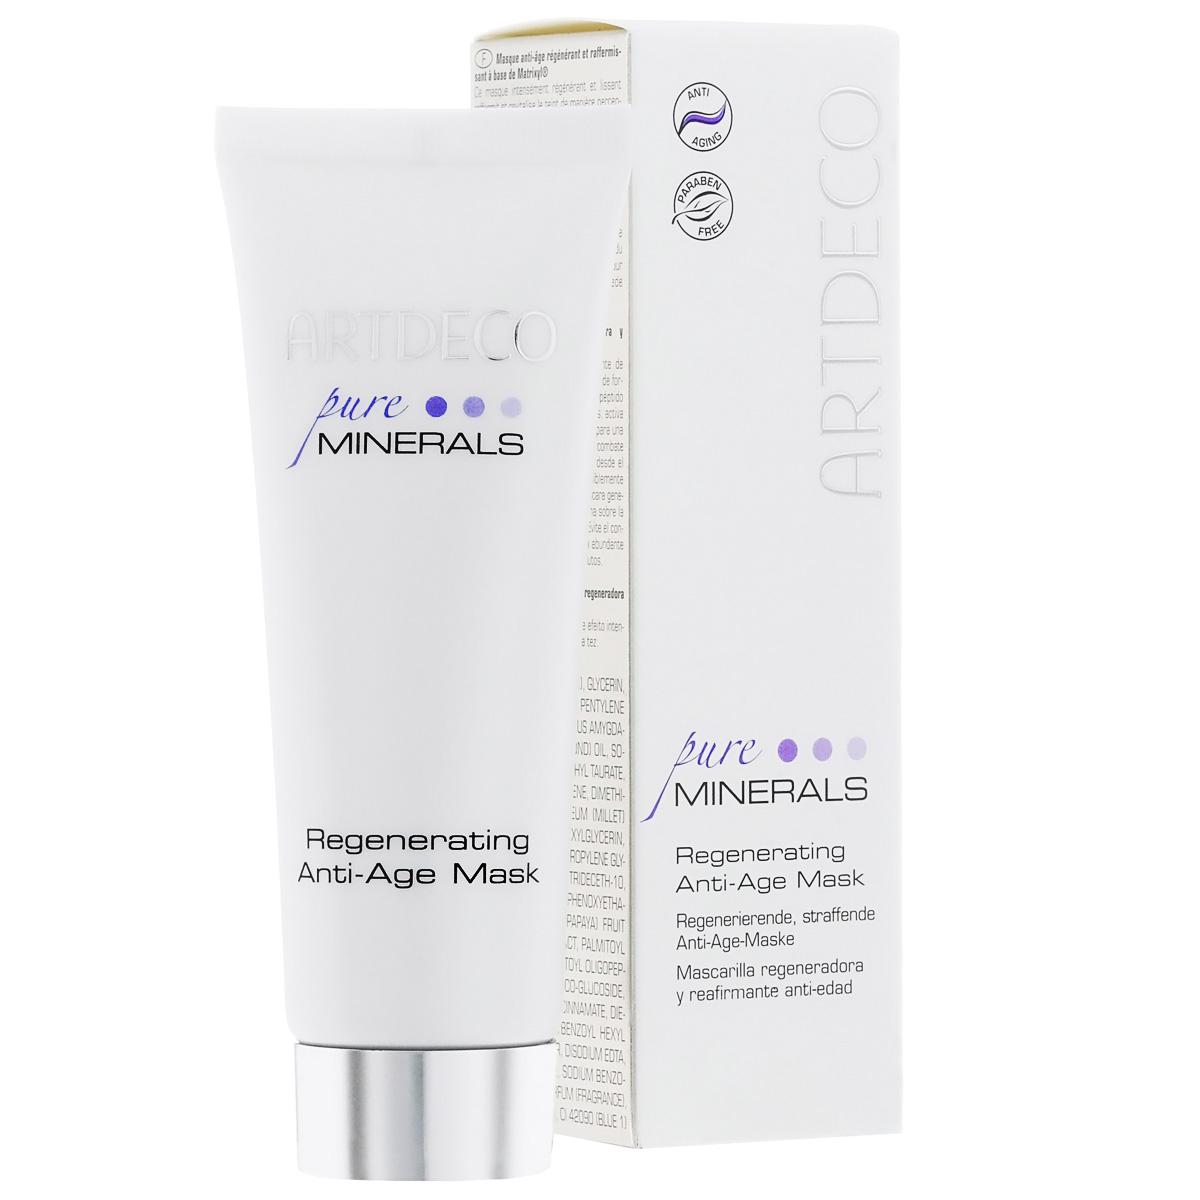 ARTDECO Восстанавливающая разглаживающая антивозрастная маска для лица Pure Minerals с Matrixyl Regenerating Anti-Age Mask, 75 мл (Artdeco)